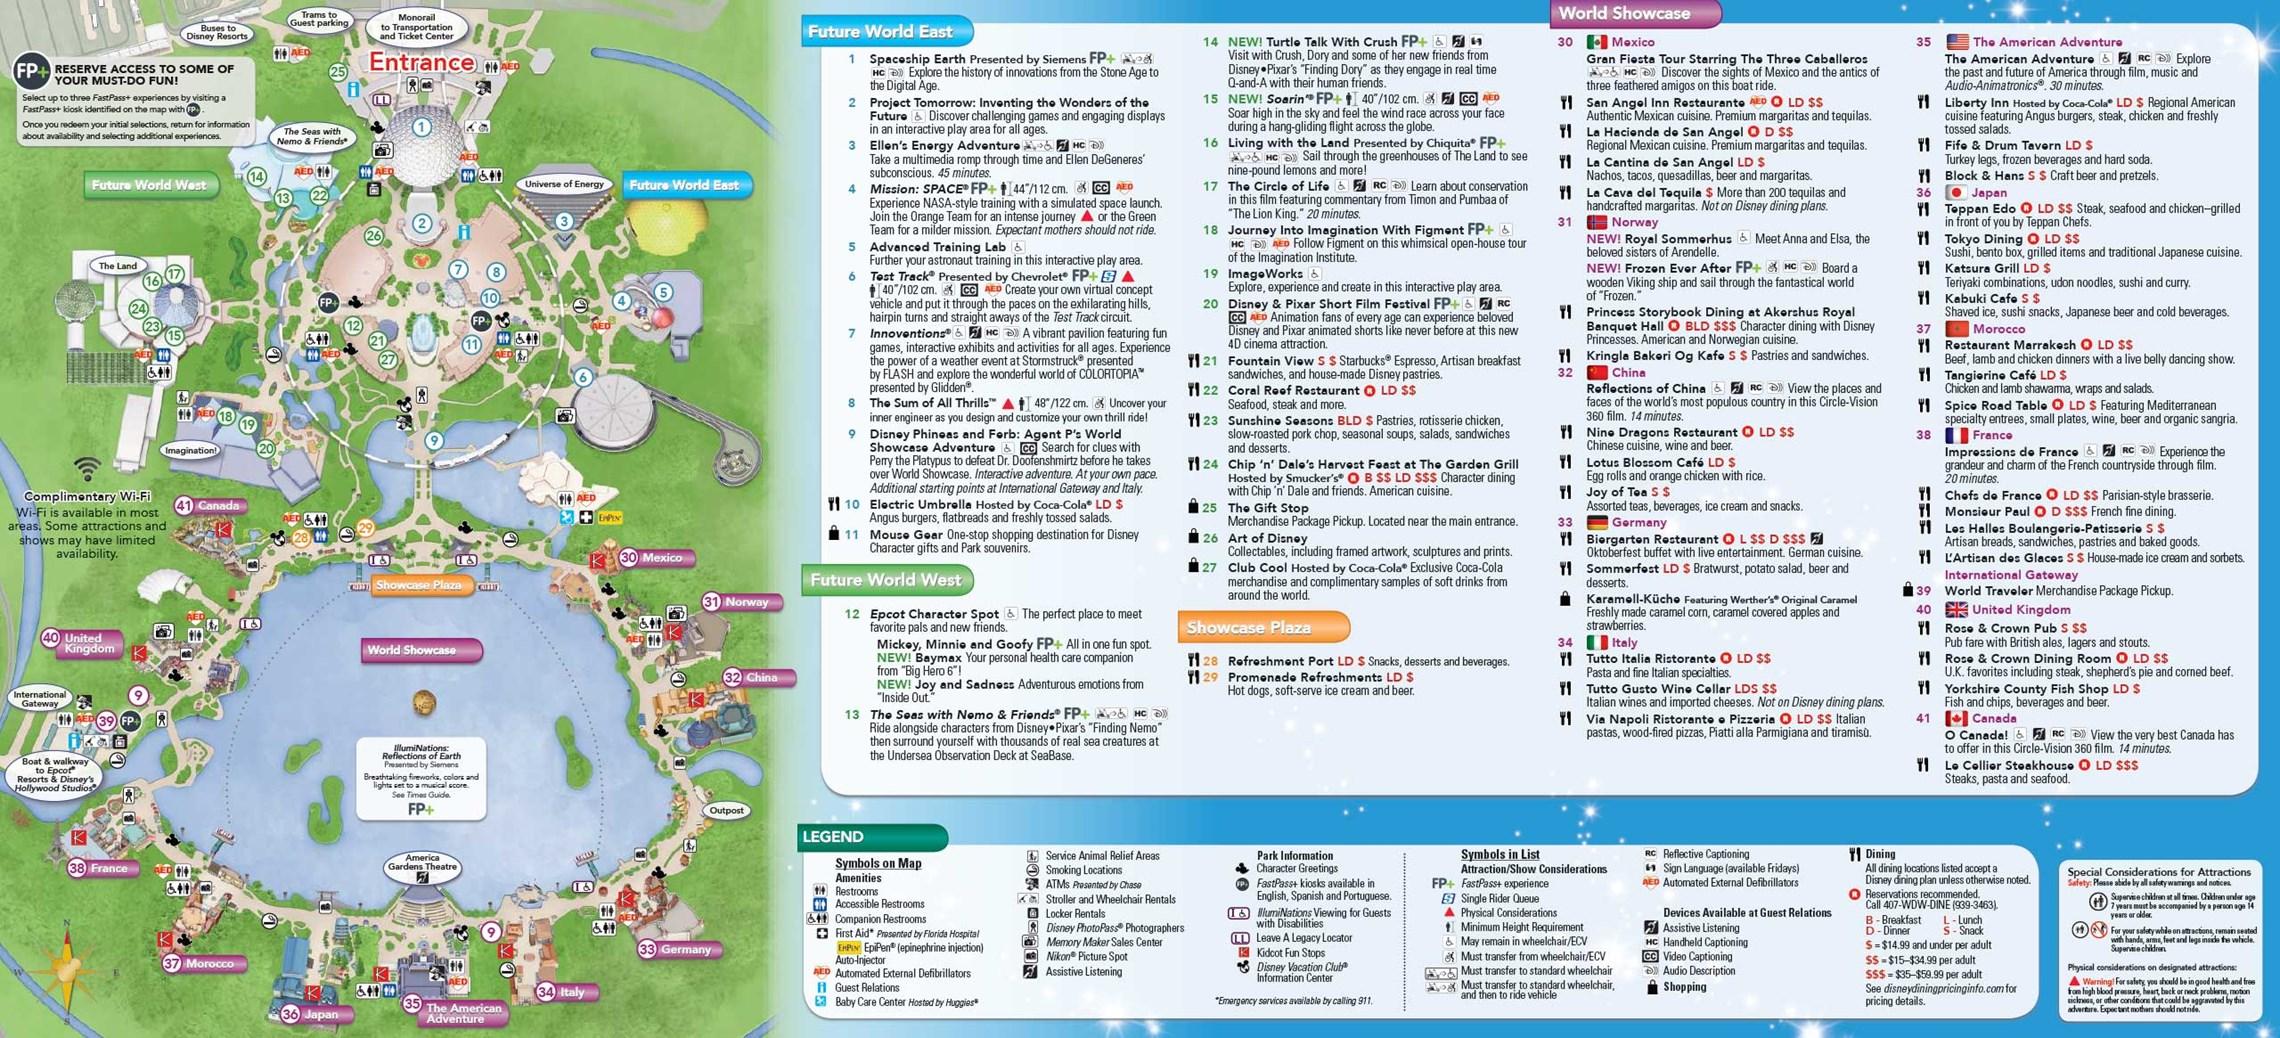 June 2016 Walt Disney World Park Maps